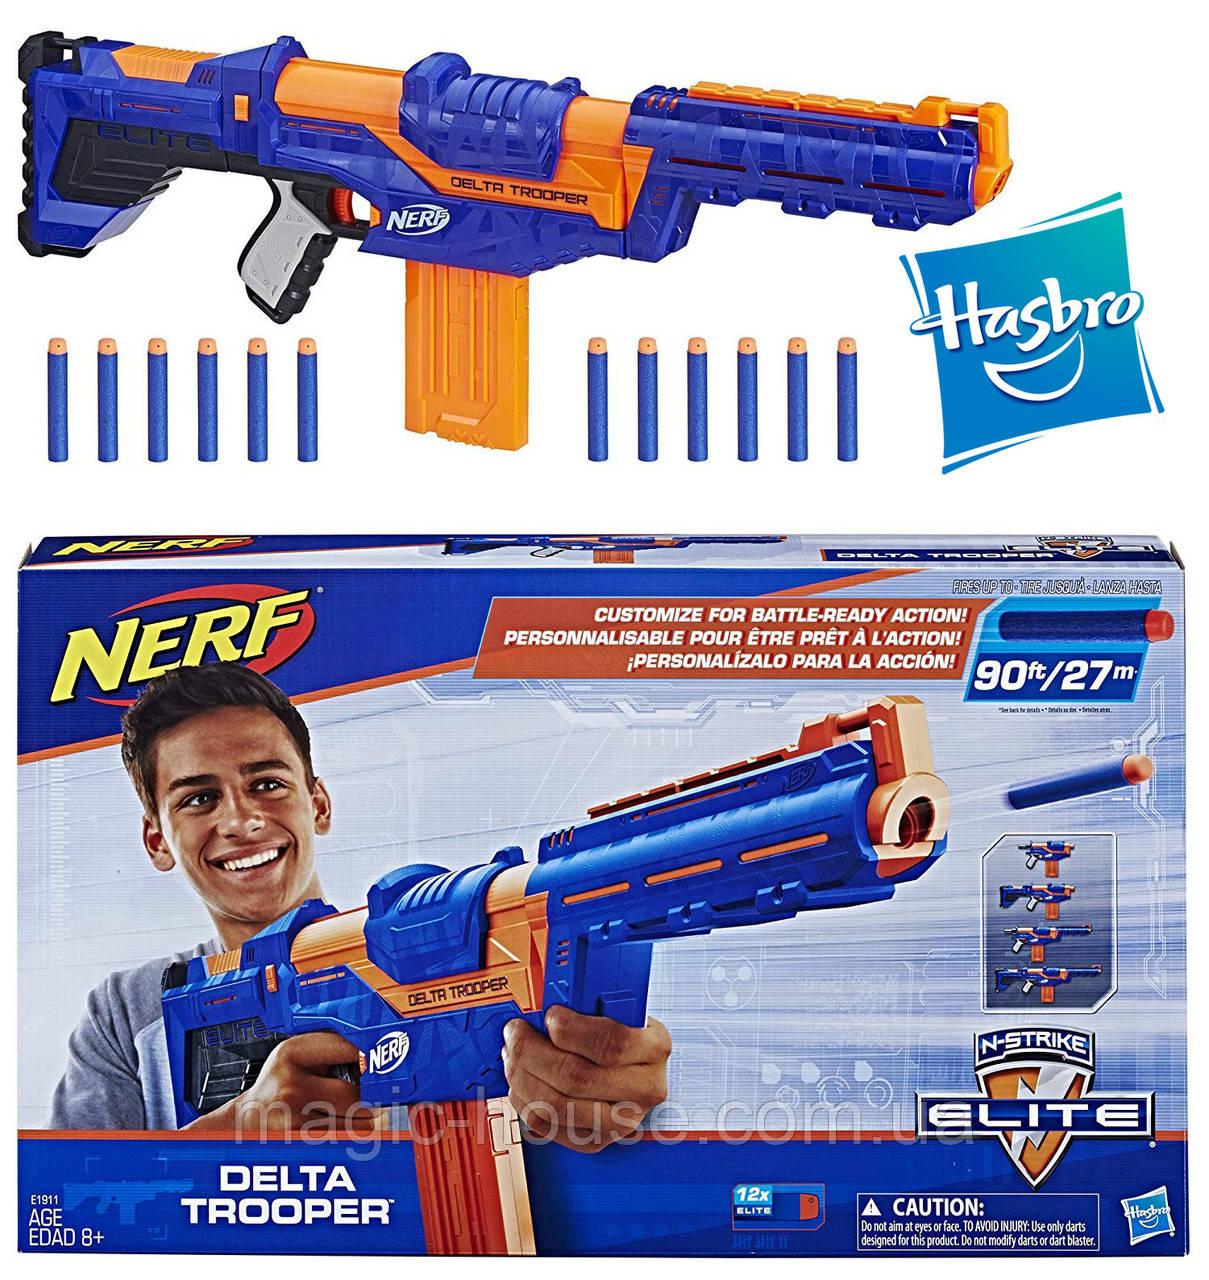 Бластер Нерф Элит Дельта Трупер  Оригинал Nerf N-Strike Elite Delta Trooper